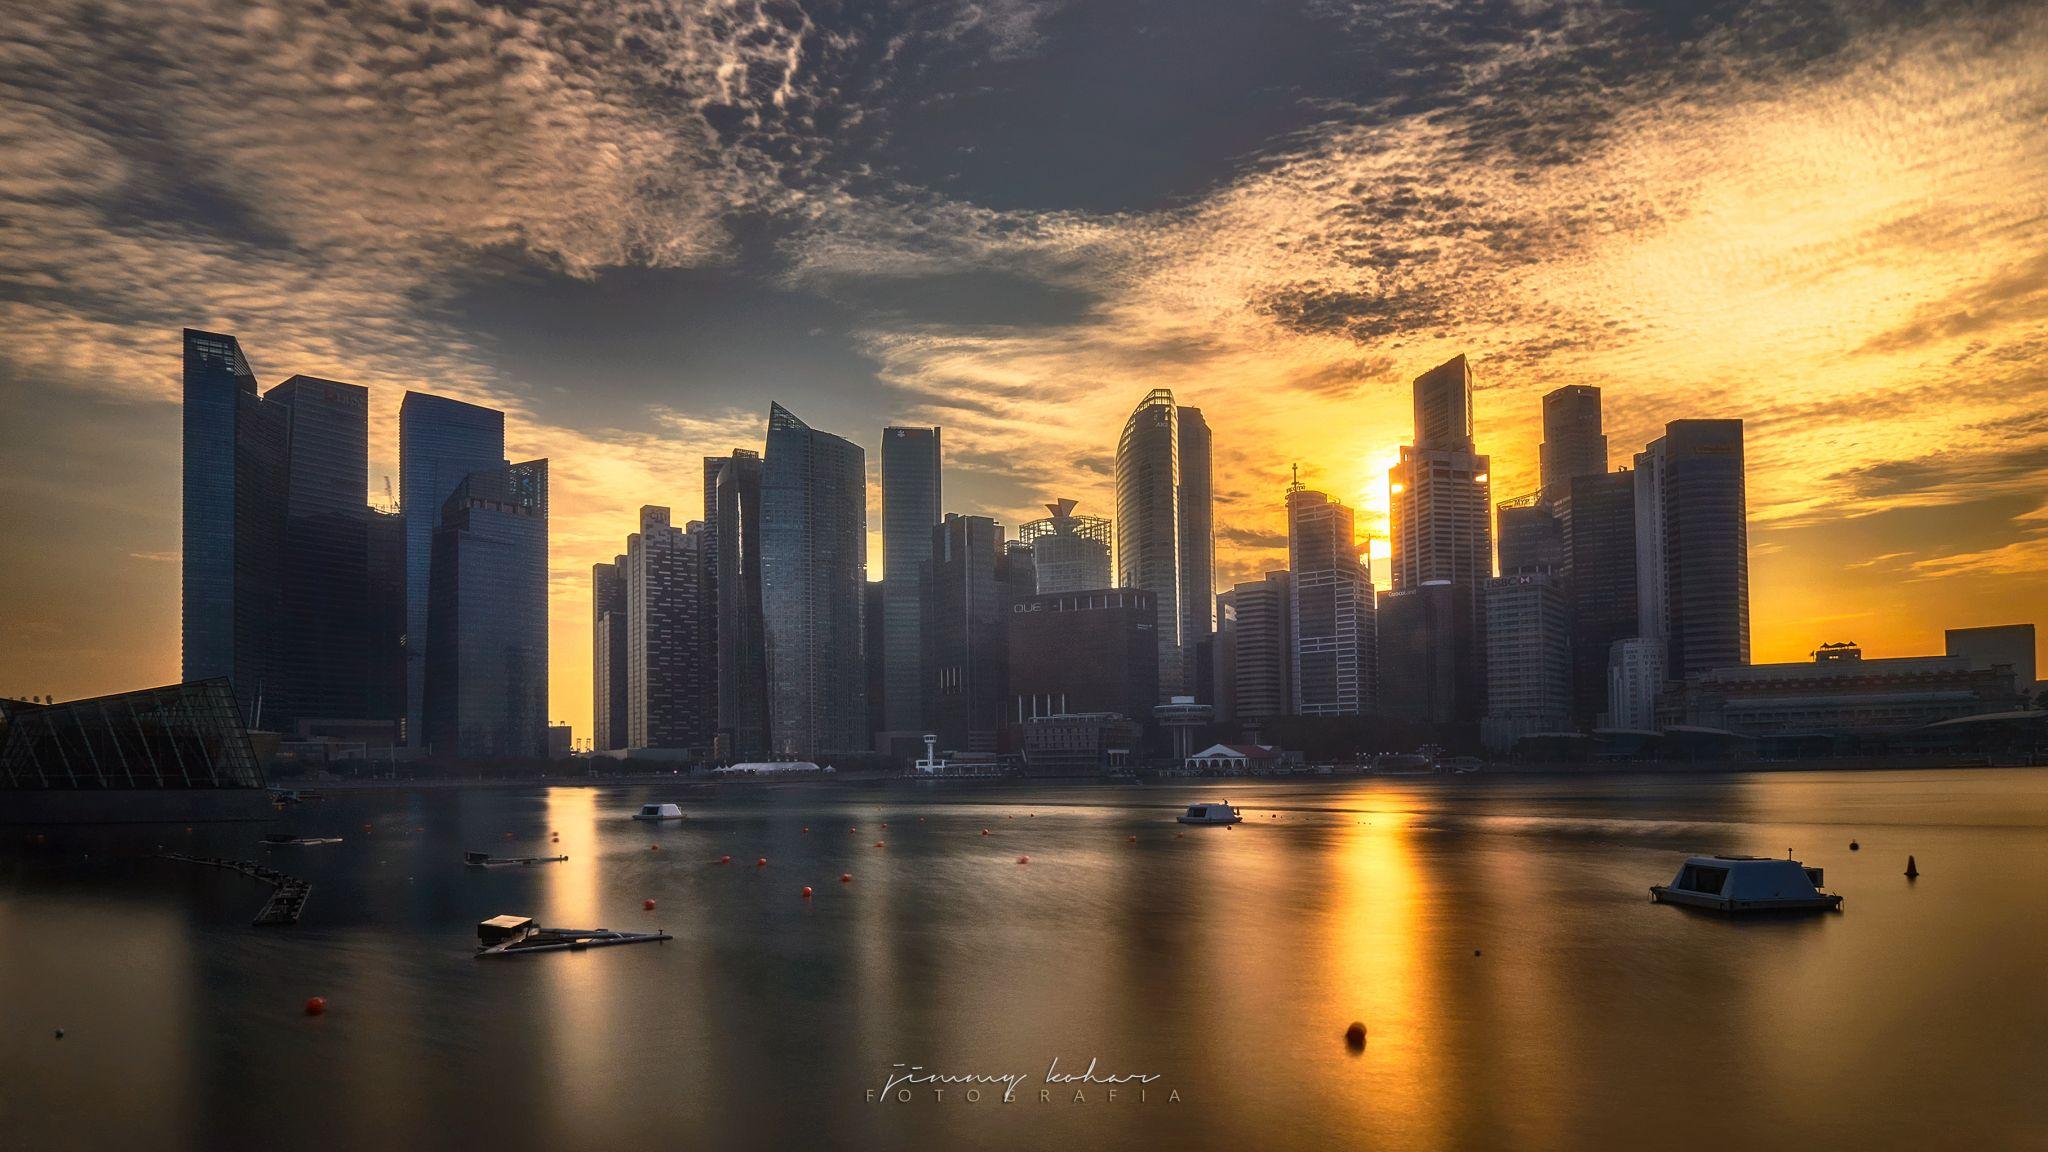 Singapore Sunset Skyline from Louis Vuitton Island Maison, Singapore